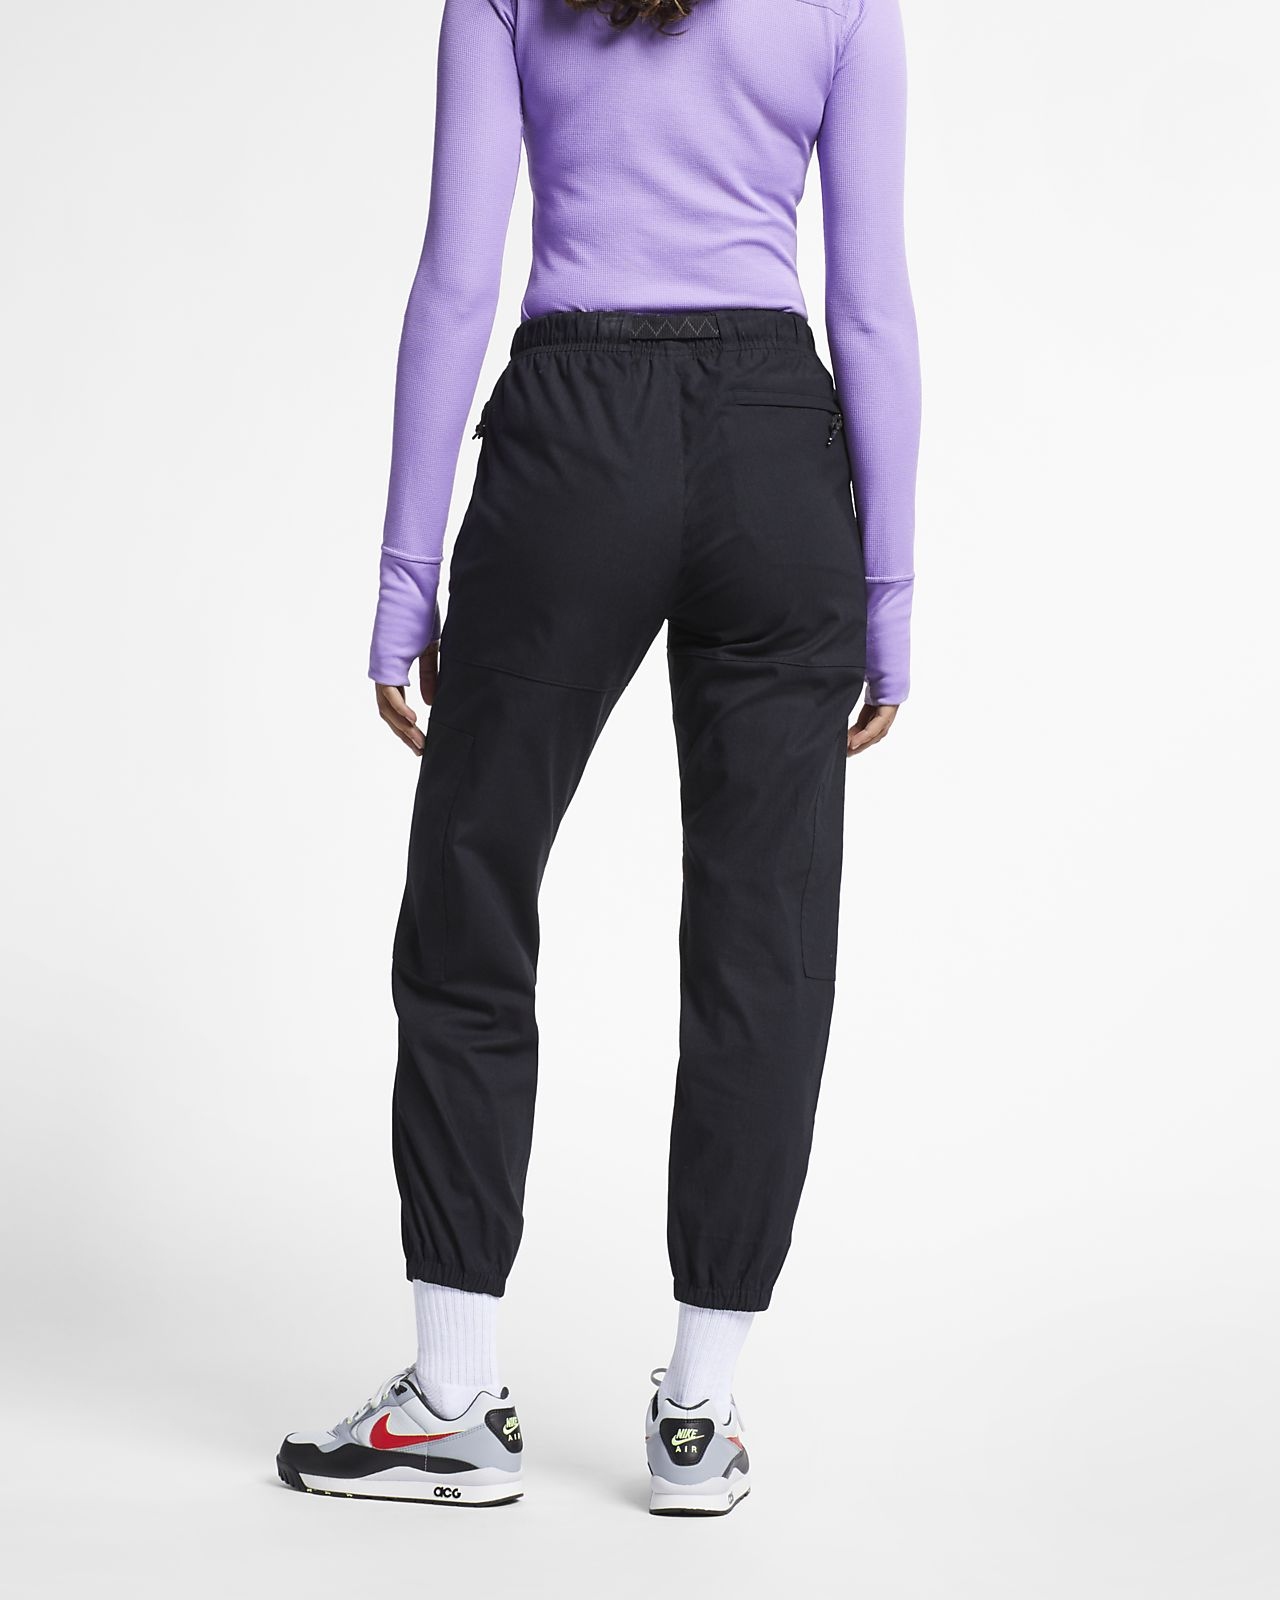 cf884bcd9 Nike ACG Women's Woven Trousers. Nike.com PT